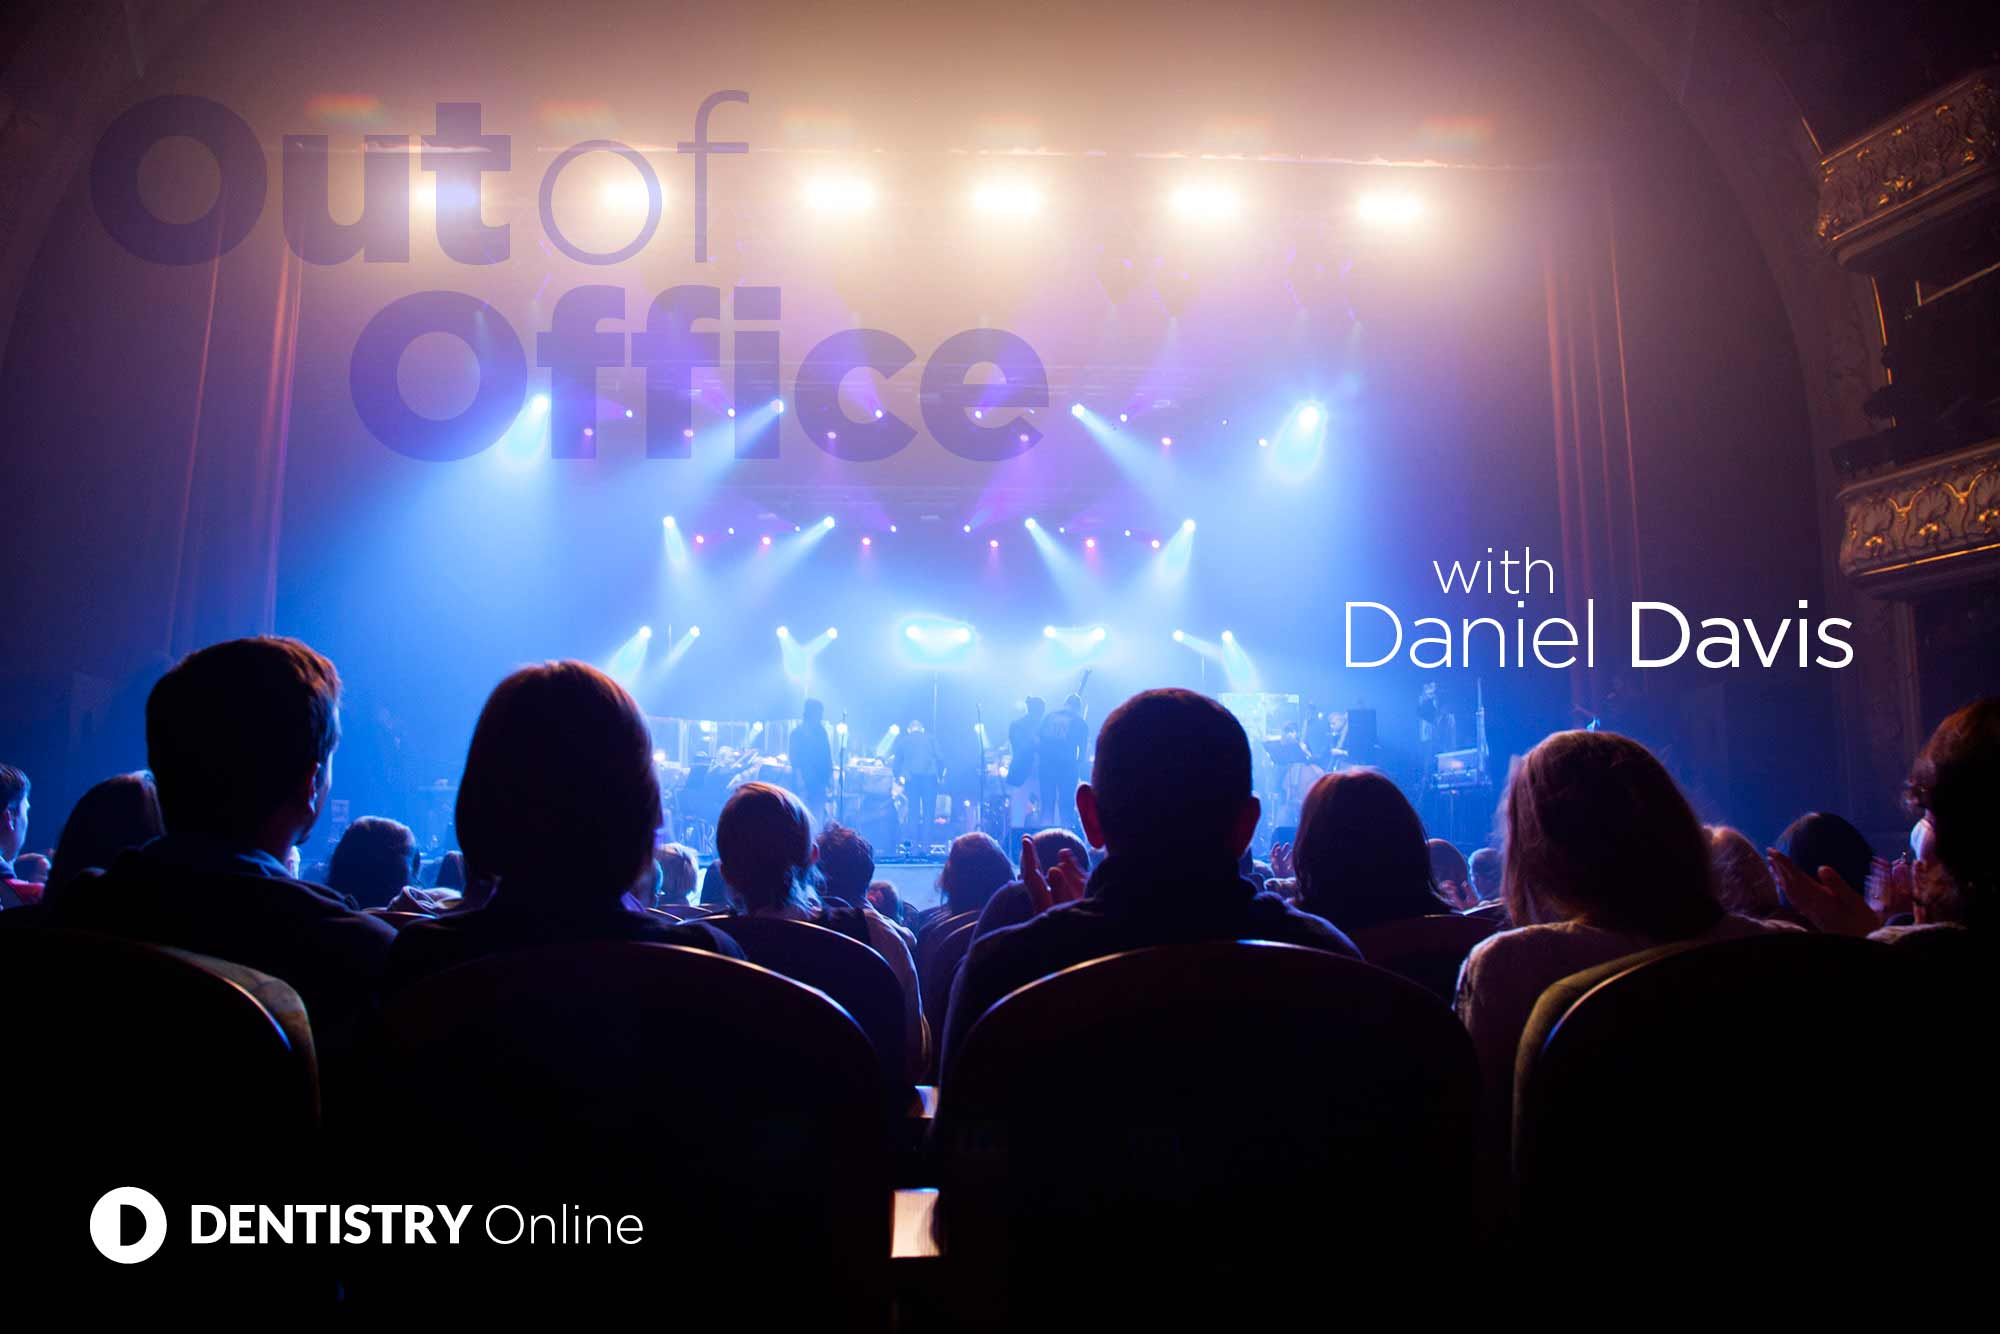 Daniel Davis on musical theatre